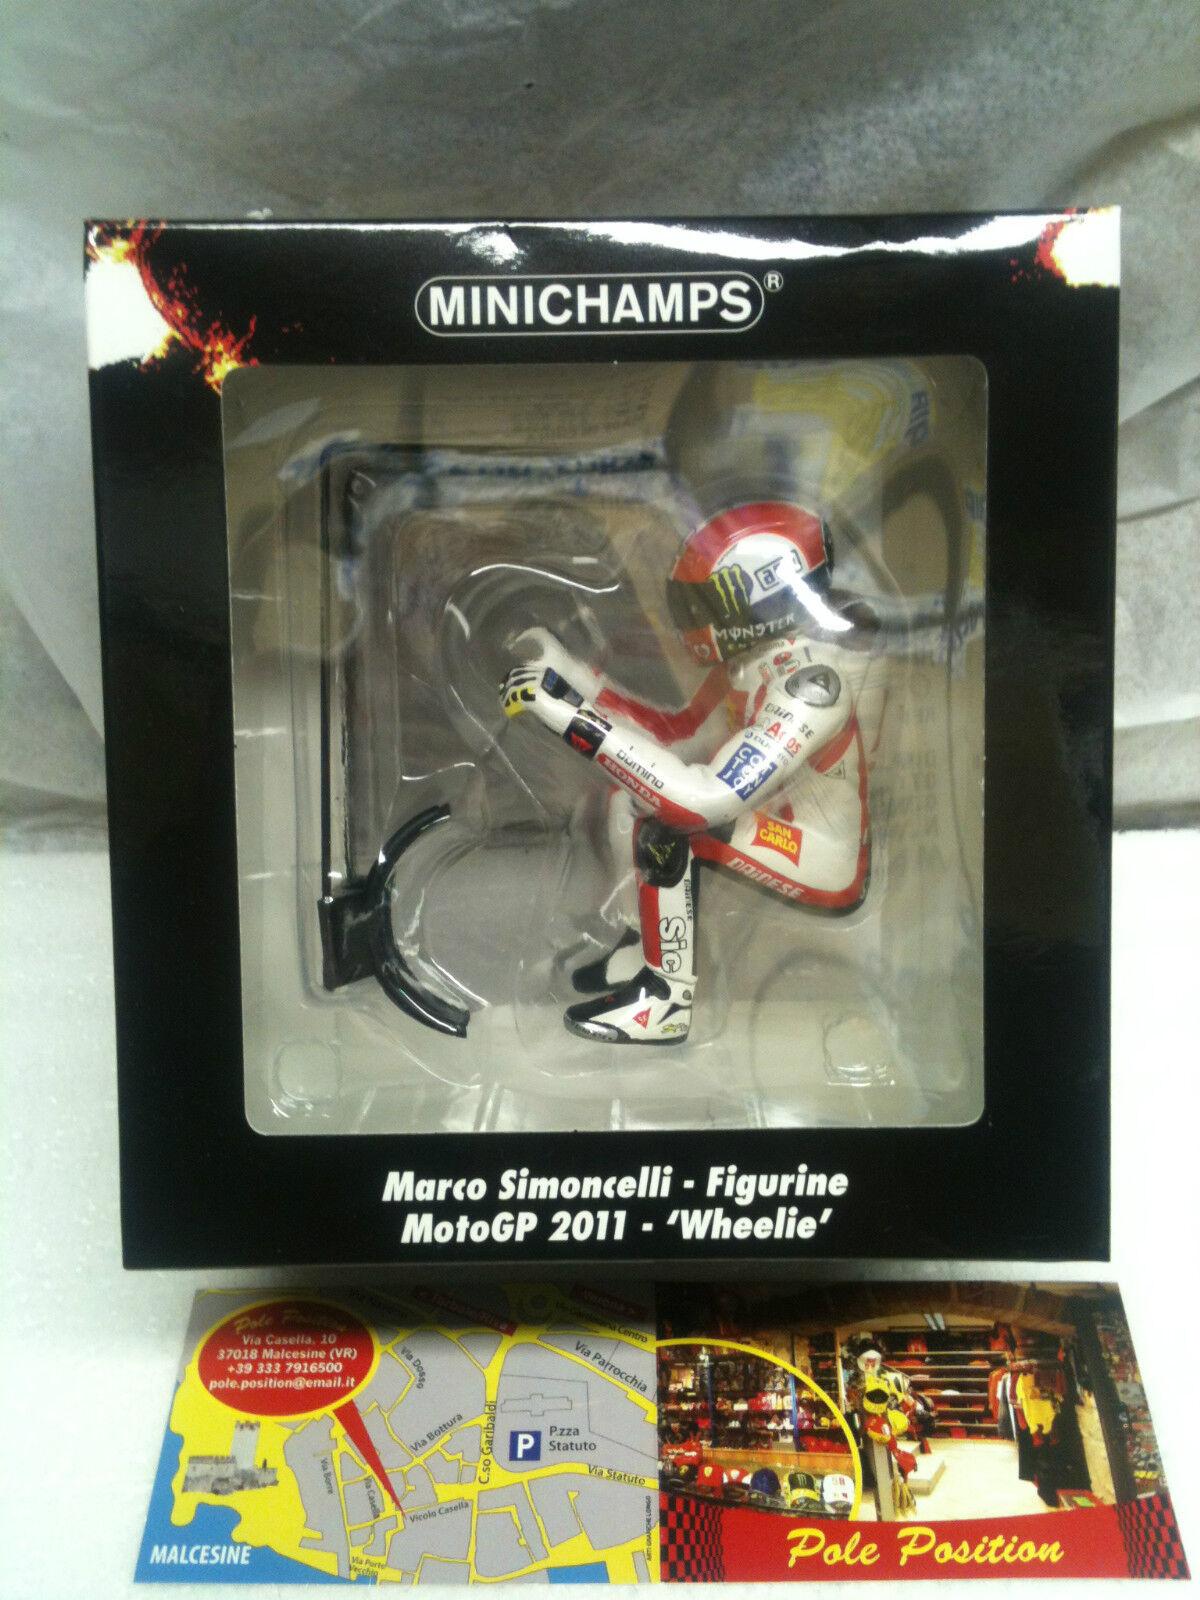 MINICHAMPS 1 12 FIGURA FIGURINE SIMONCELLI MOTOGP 2011 -´WHEELIE´ L.E. 1158 pcs.